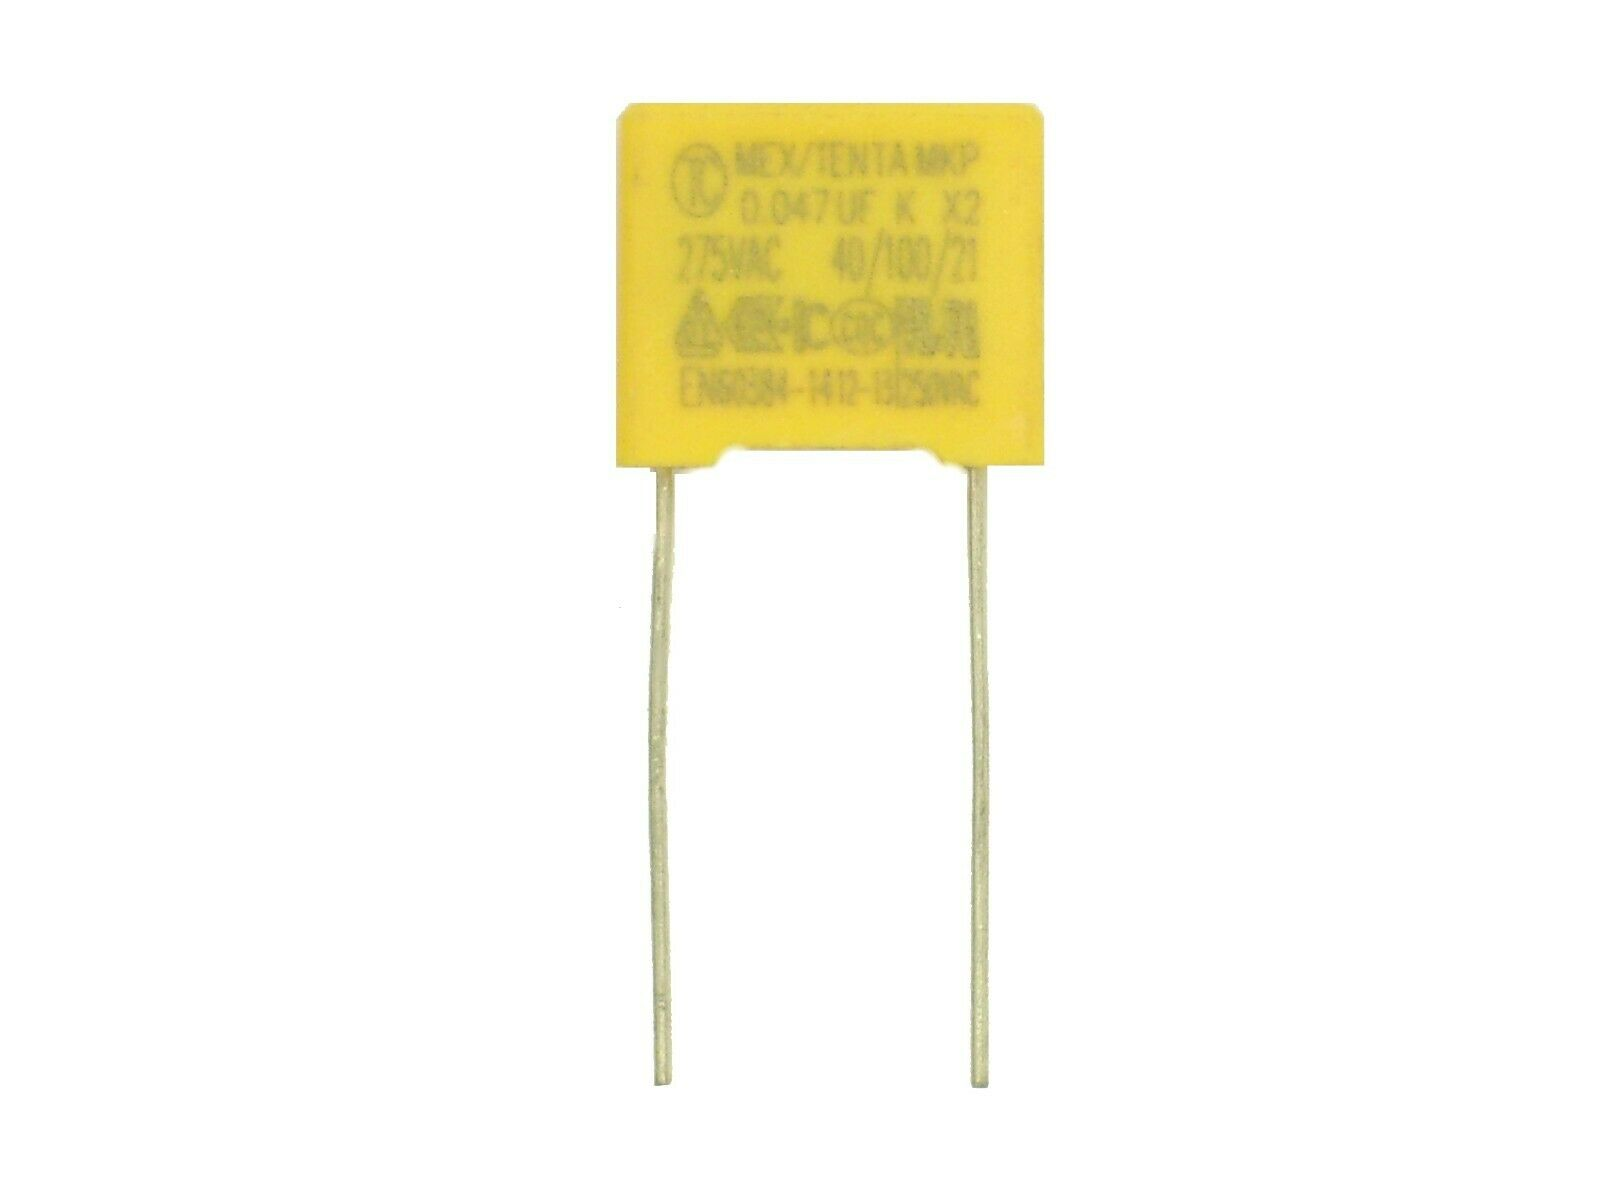 Condensador de supresi/ón 0,1/µF 250V X2 Miflex KSPpzp-5 ; 0,1uF